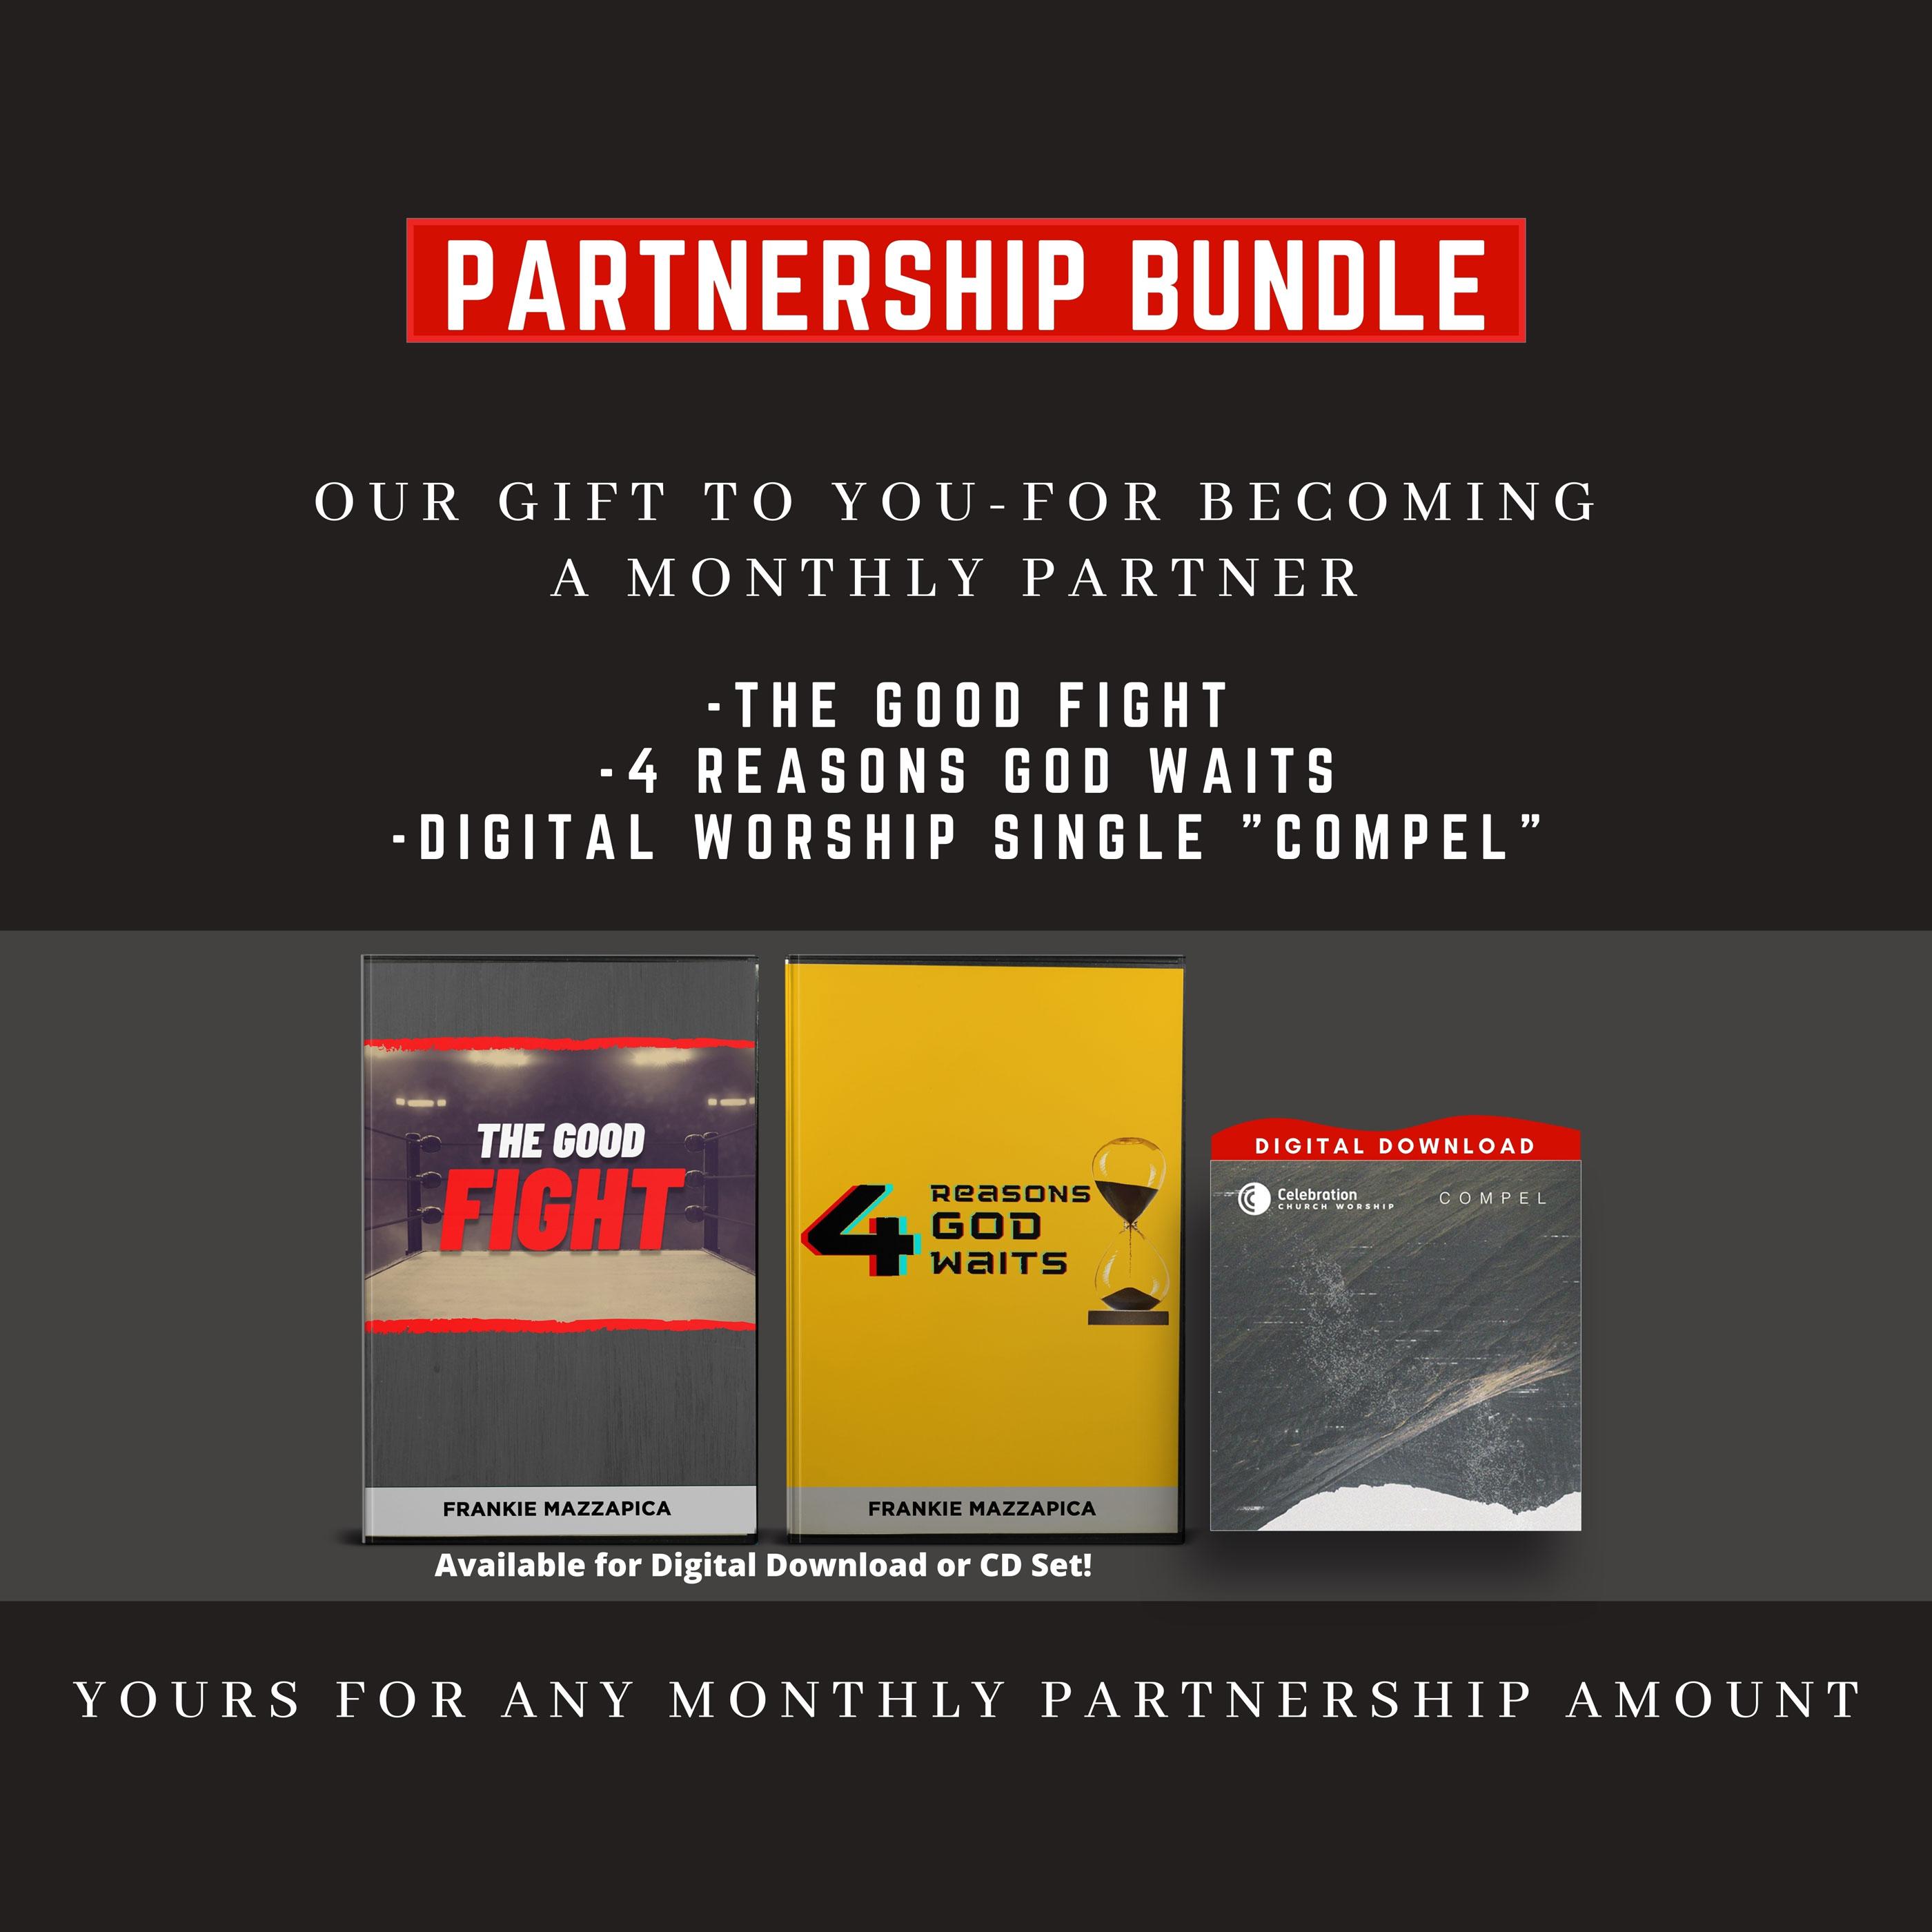 Partnership Bundle